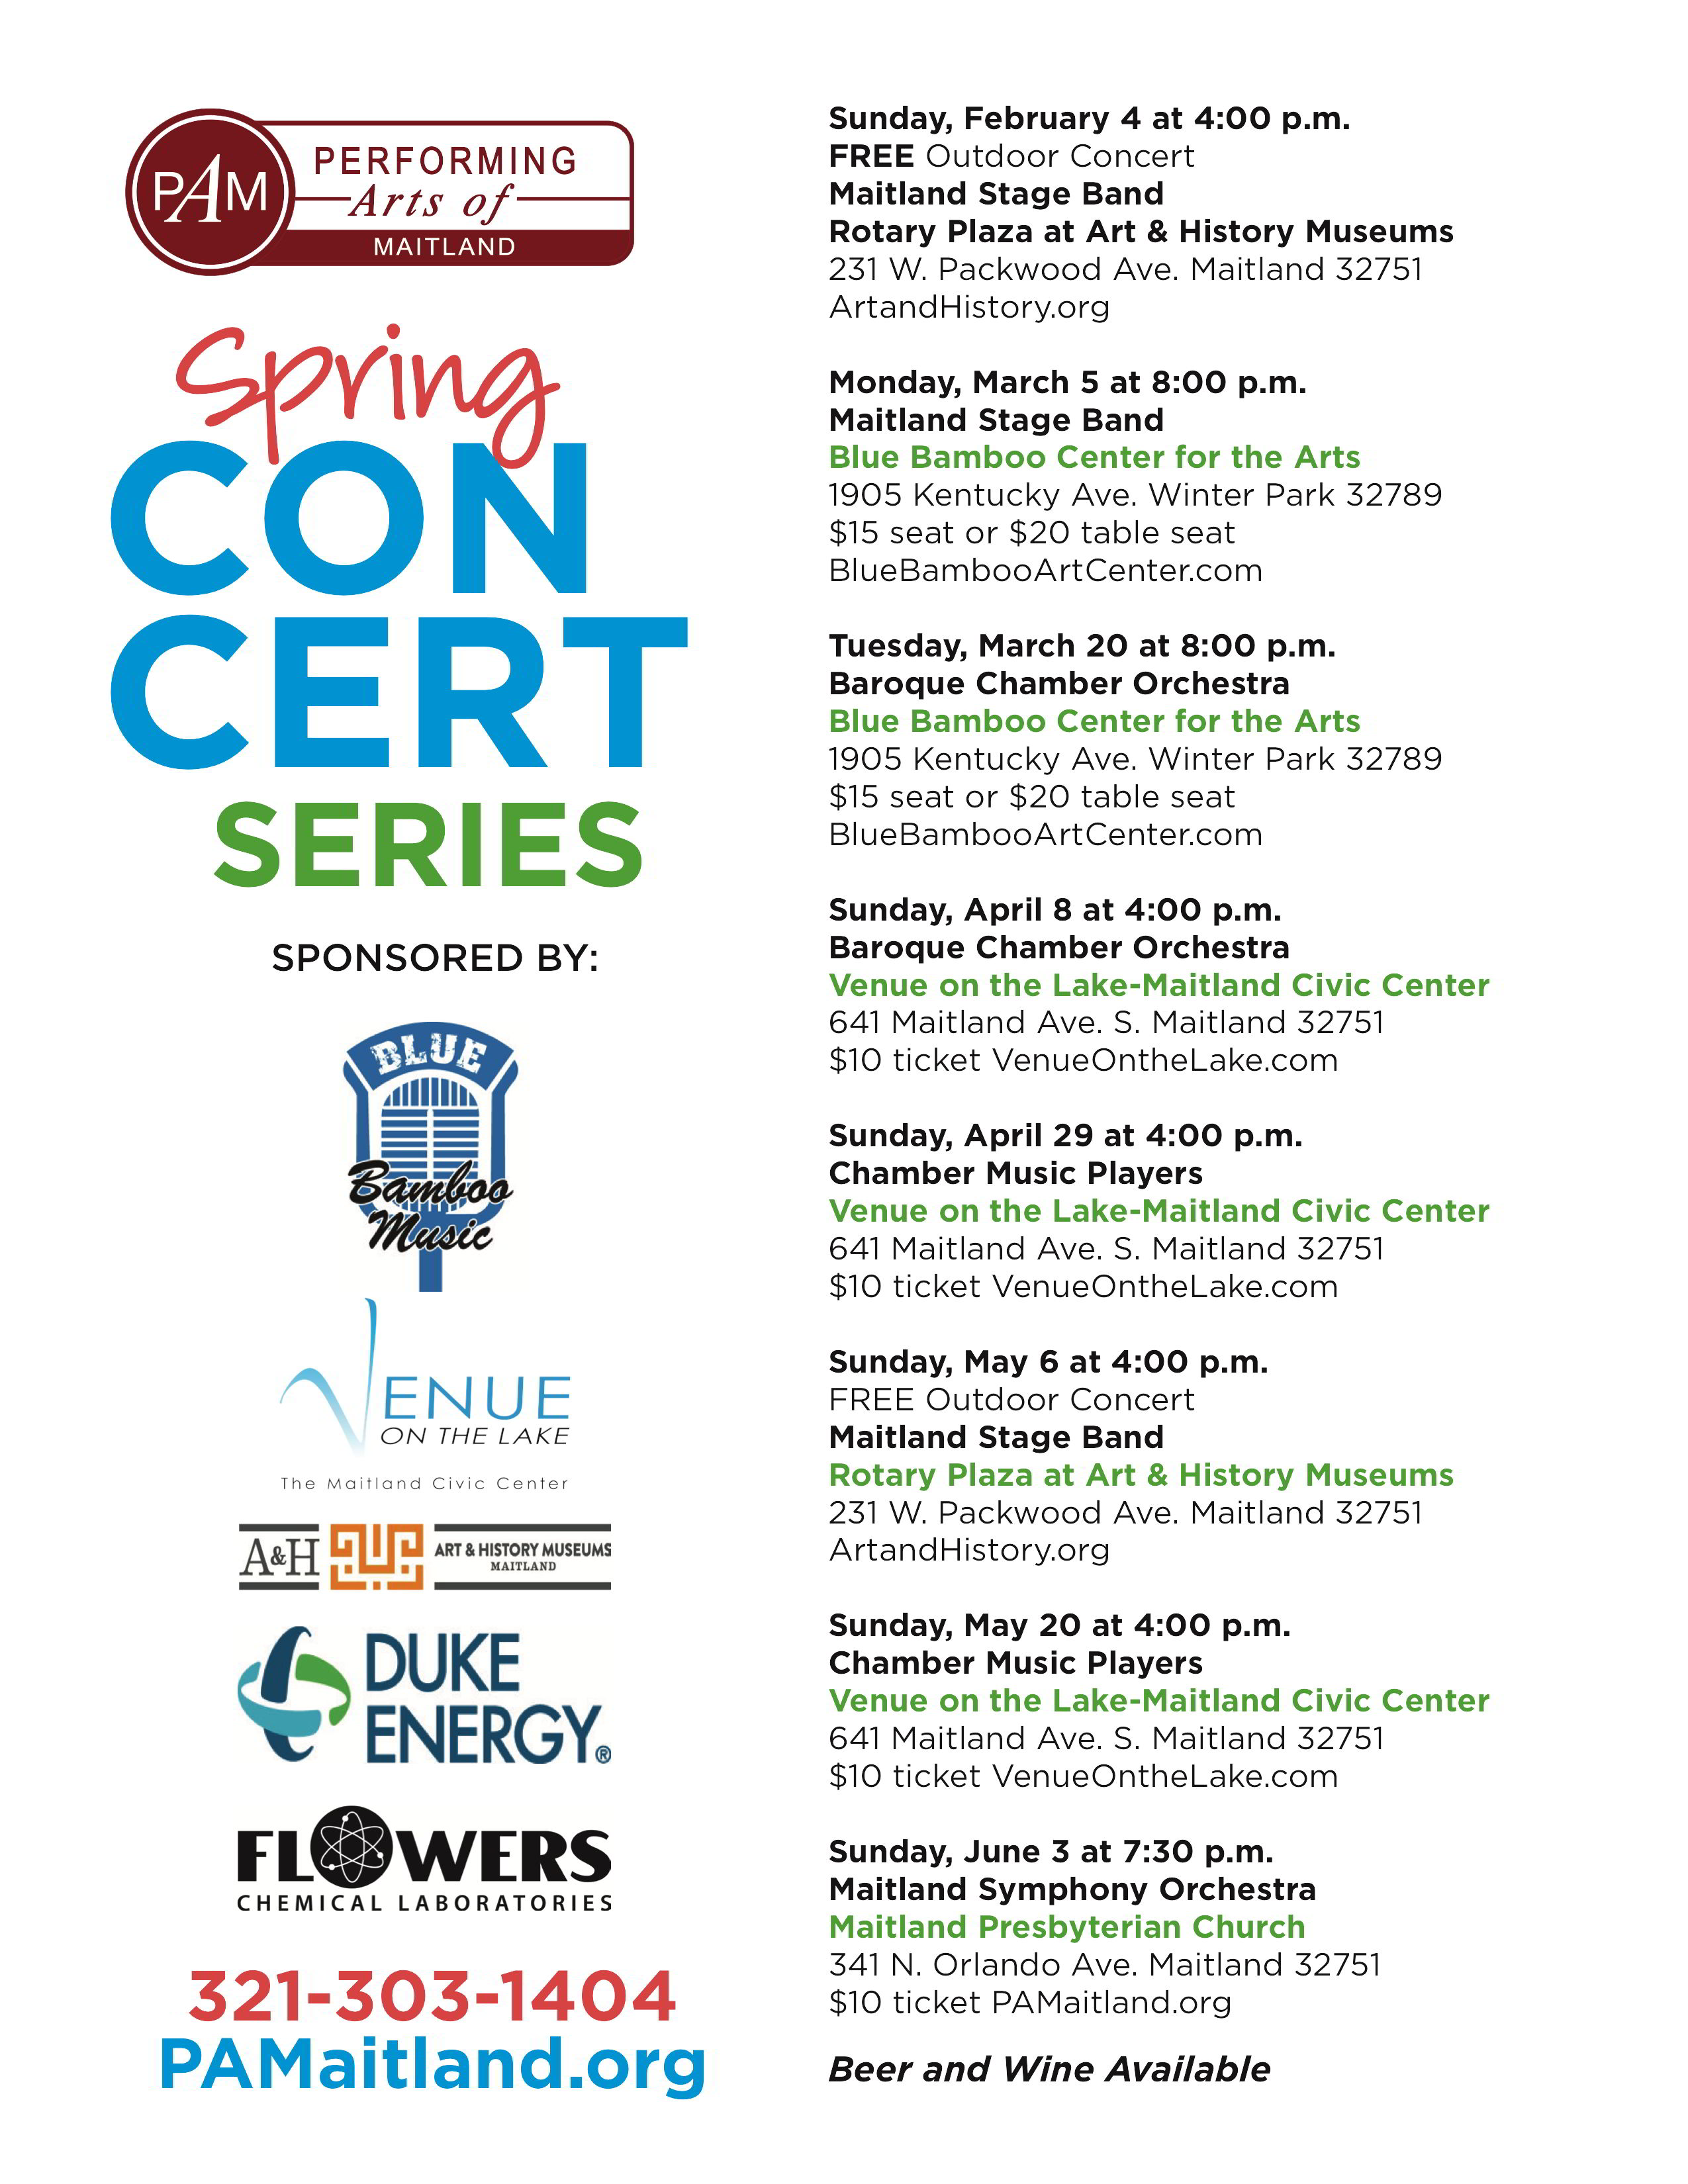 pam_spring_concert_series_2018_flyer